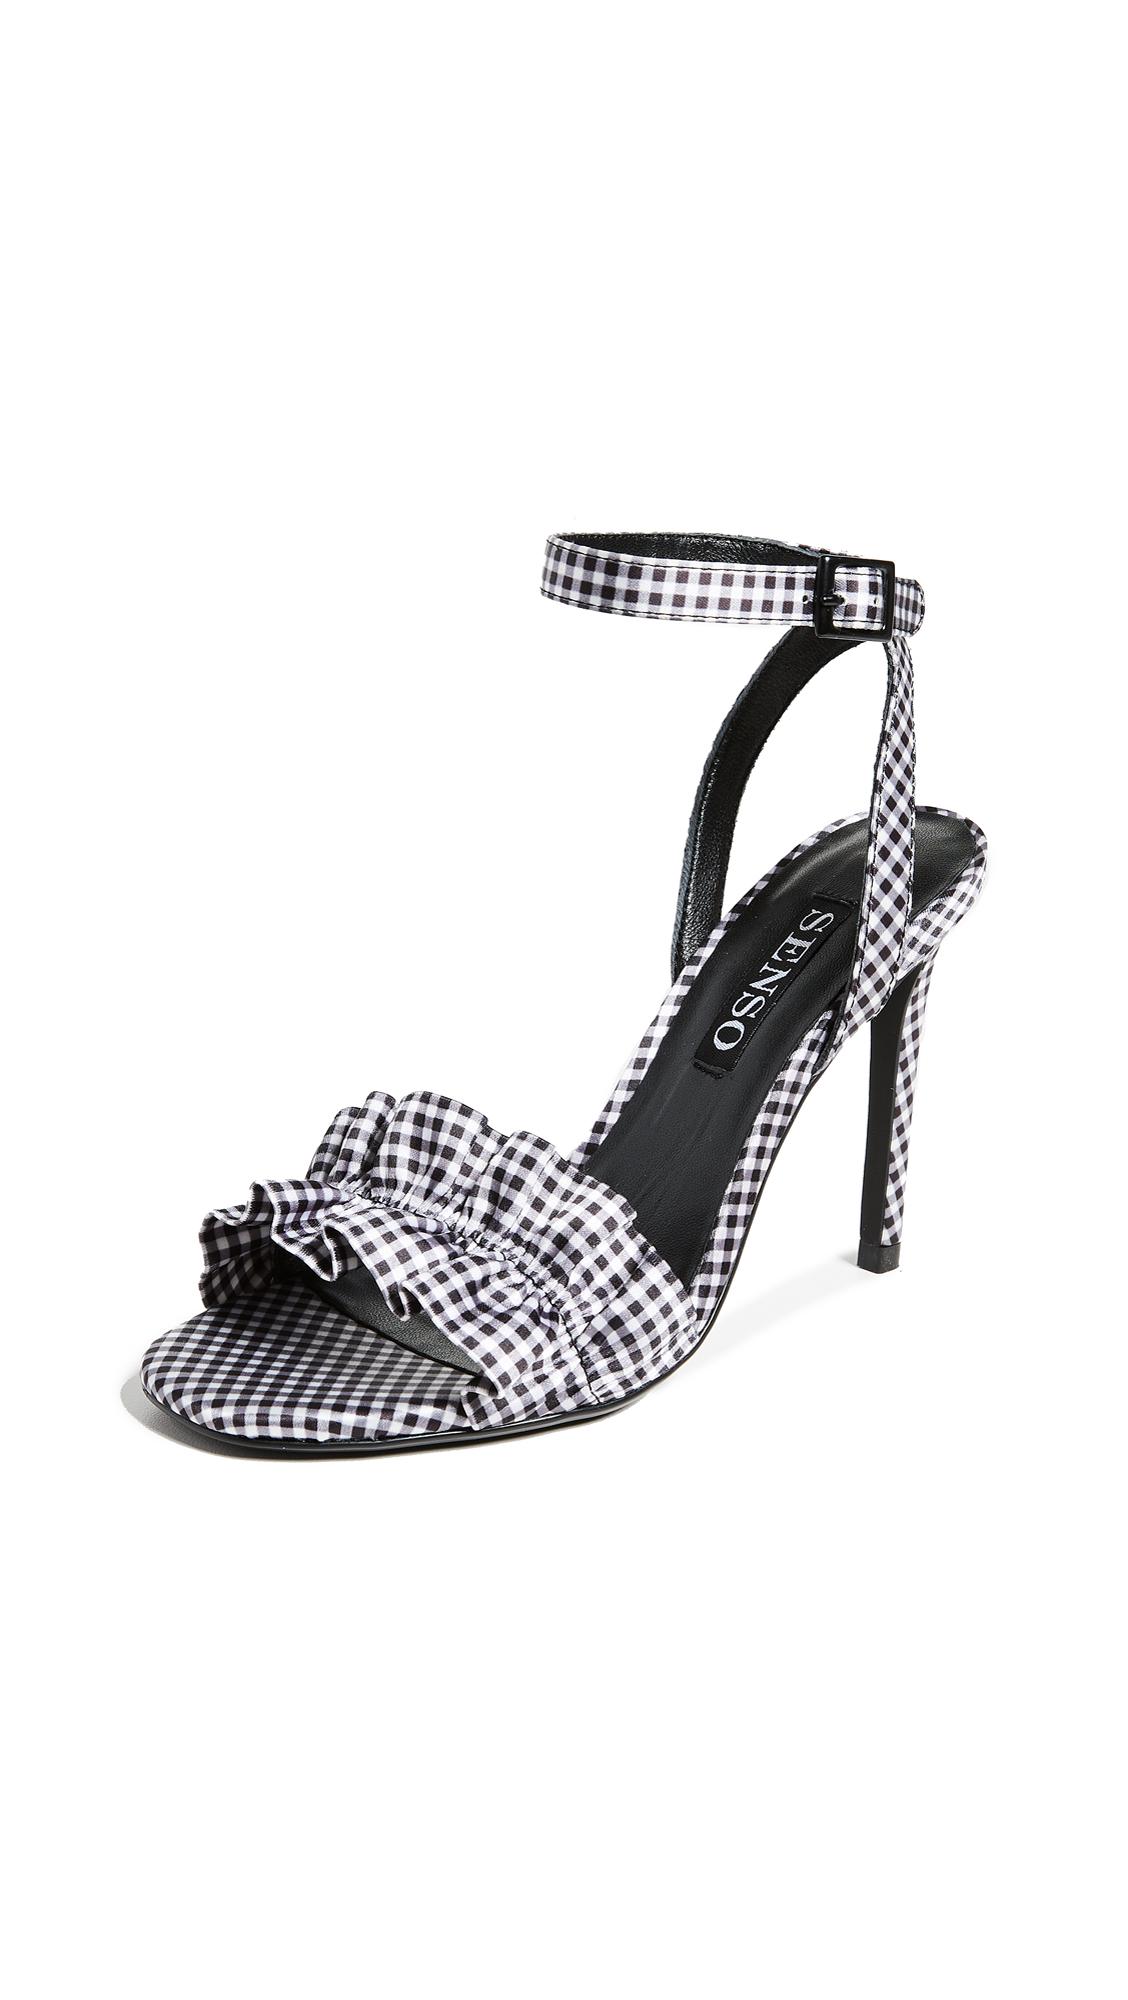 SENSO Ureeka II Sandals - Ebony